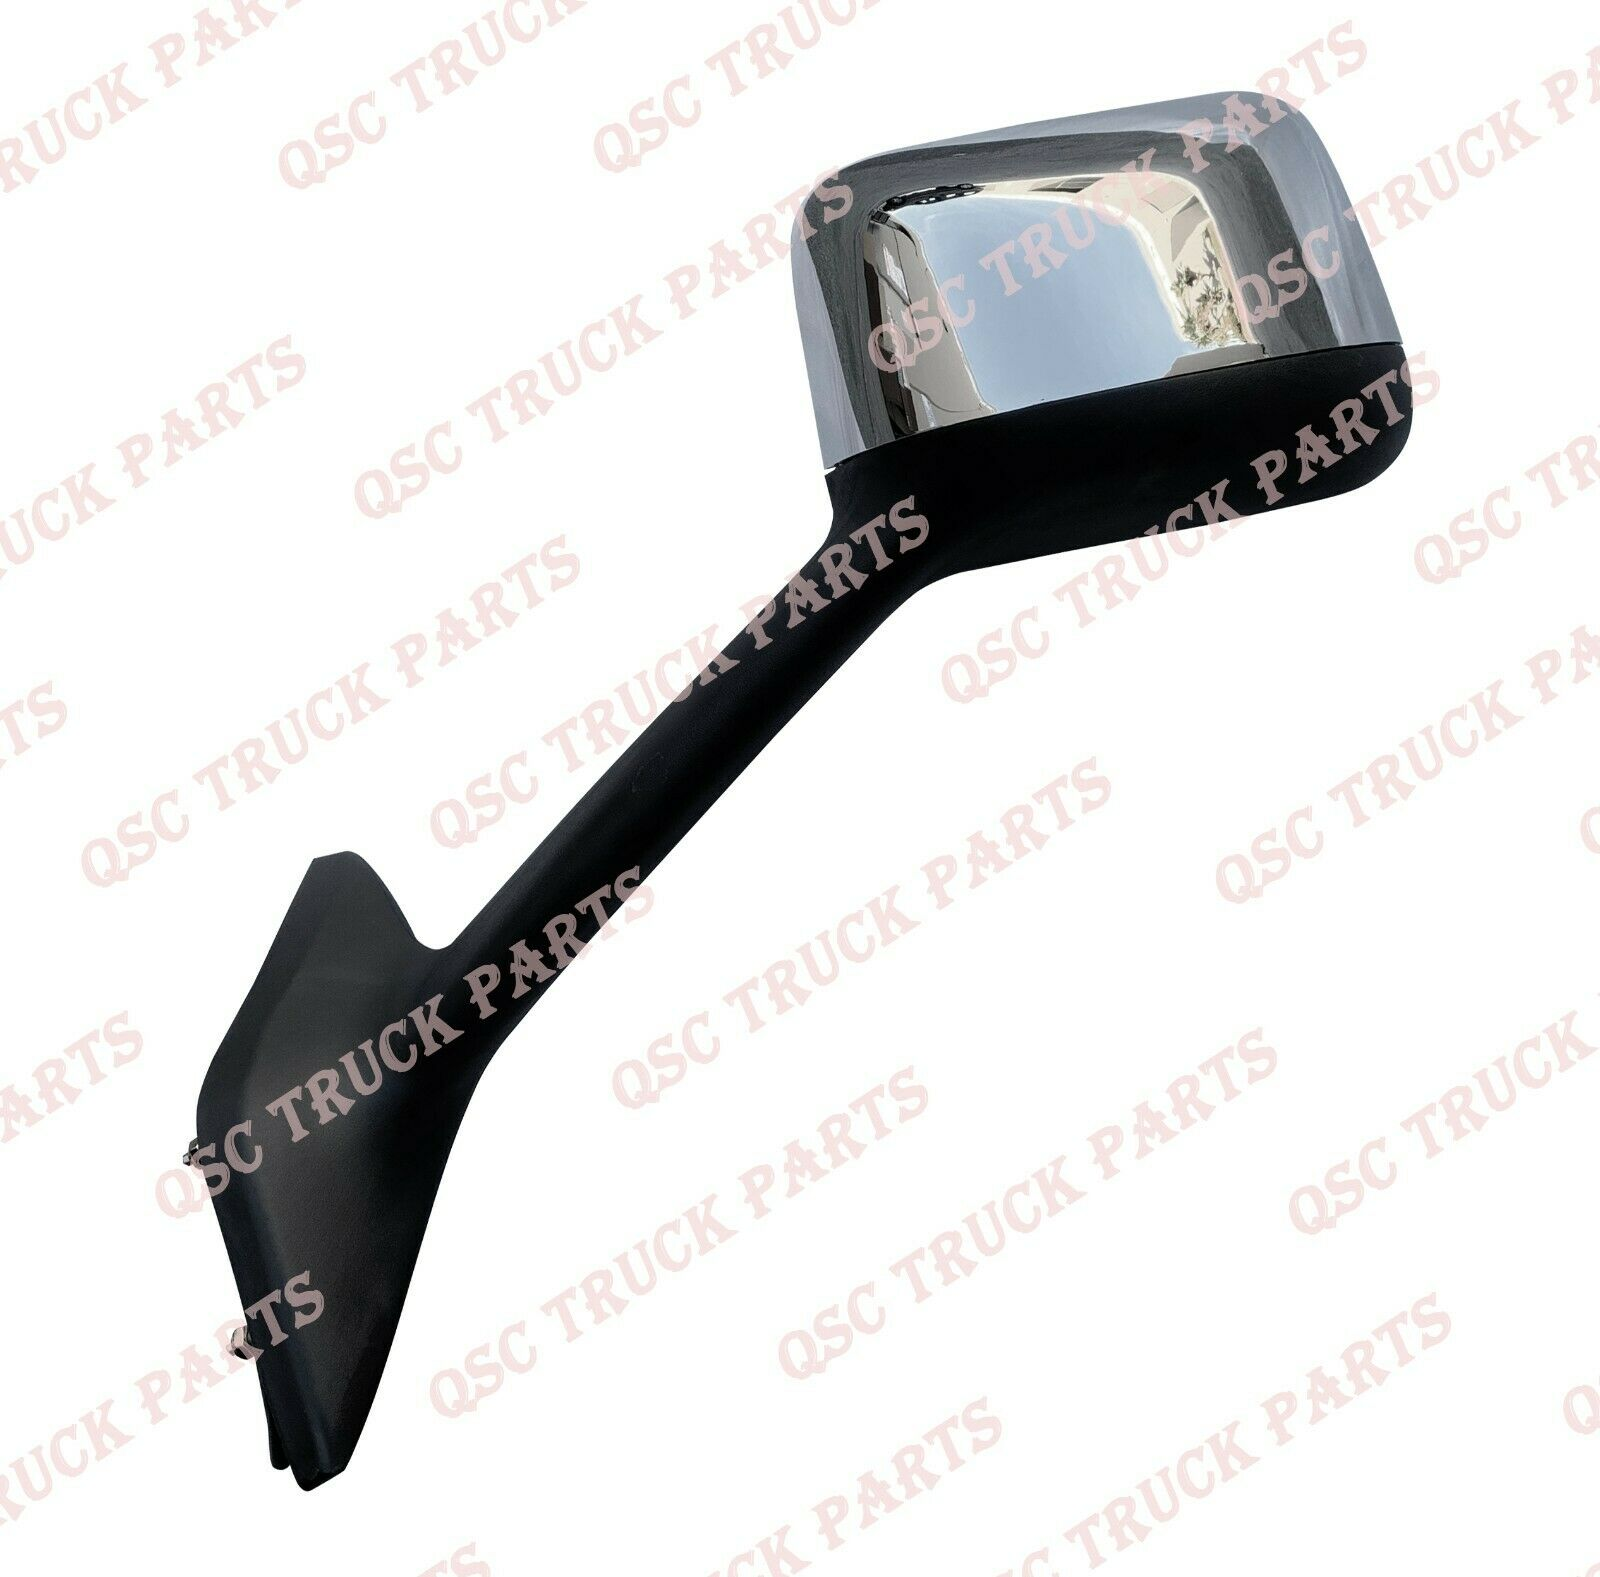 -Chrome Driver side WITH install kit 2007 International PROSTAR-LH Door mount spotlight 6 inch LED